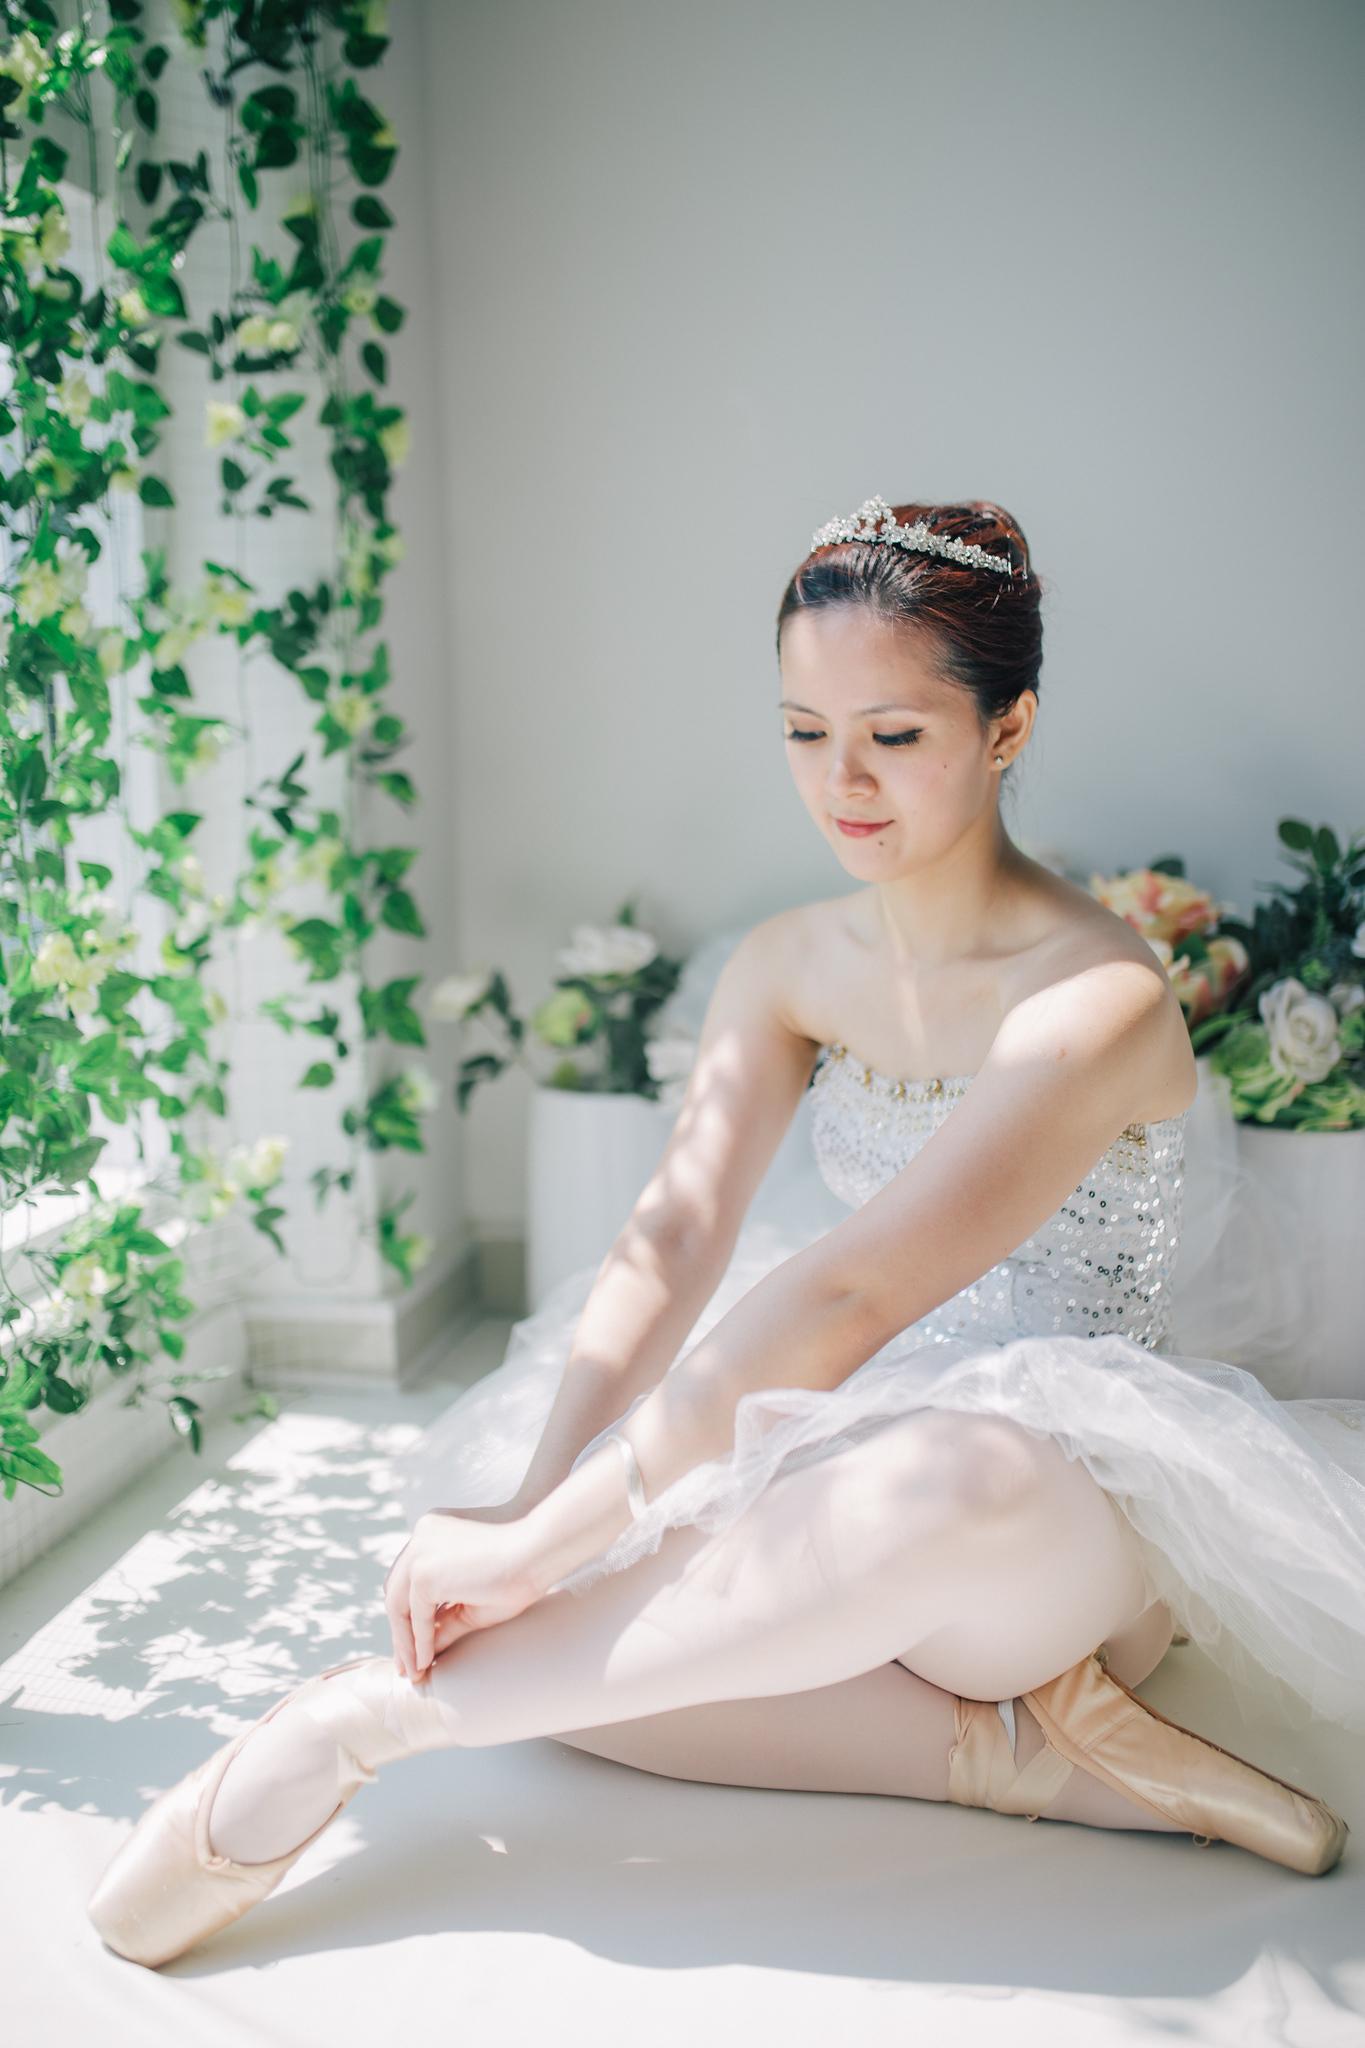 Ballet Dance Photo Shoot